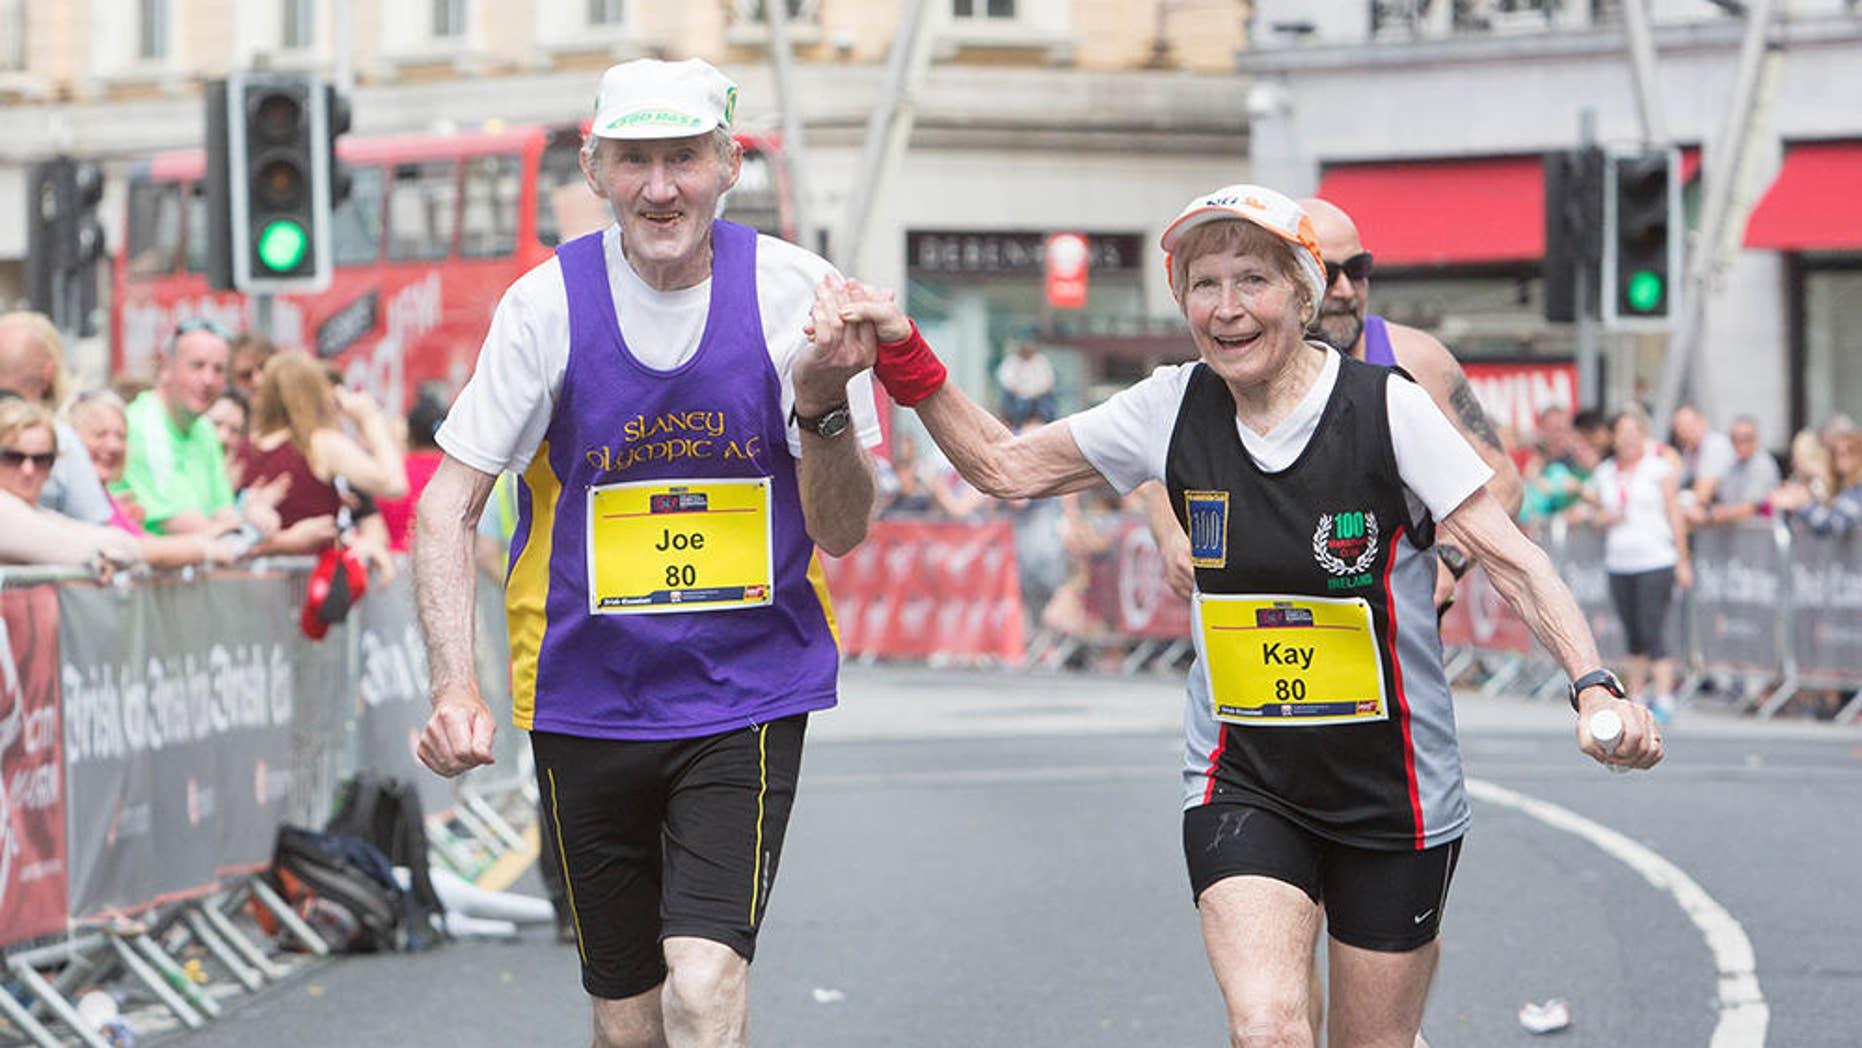 Kay and Joe O'Regan grasp hands as they approach the finish line of the 2016 Cork City Marathon. (photograph courtesy of Cork City Marathon)